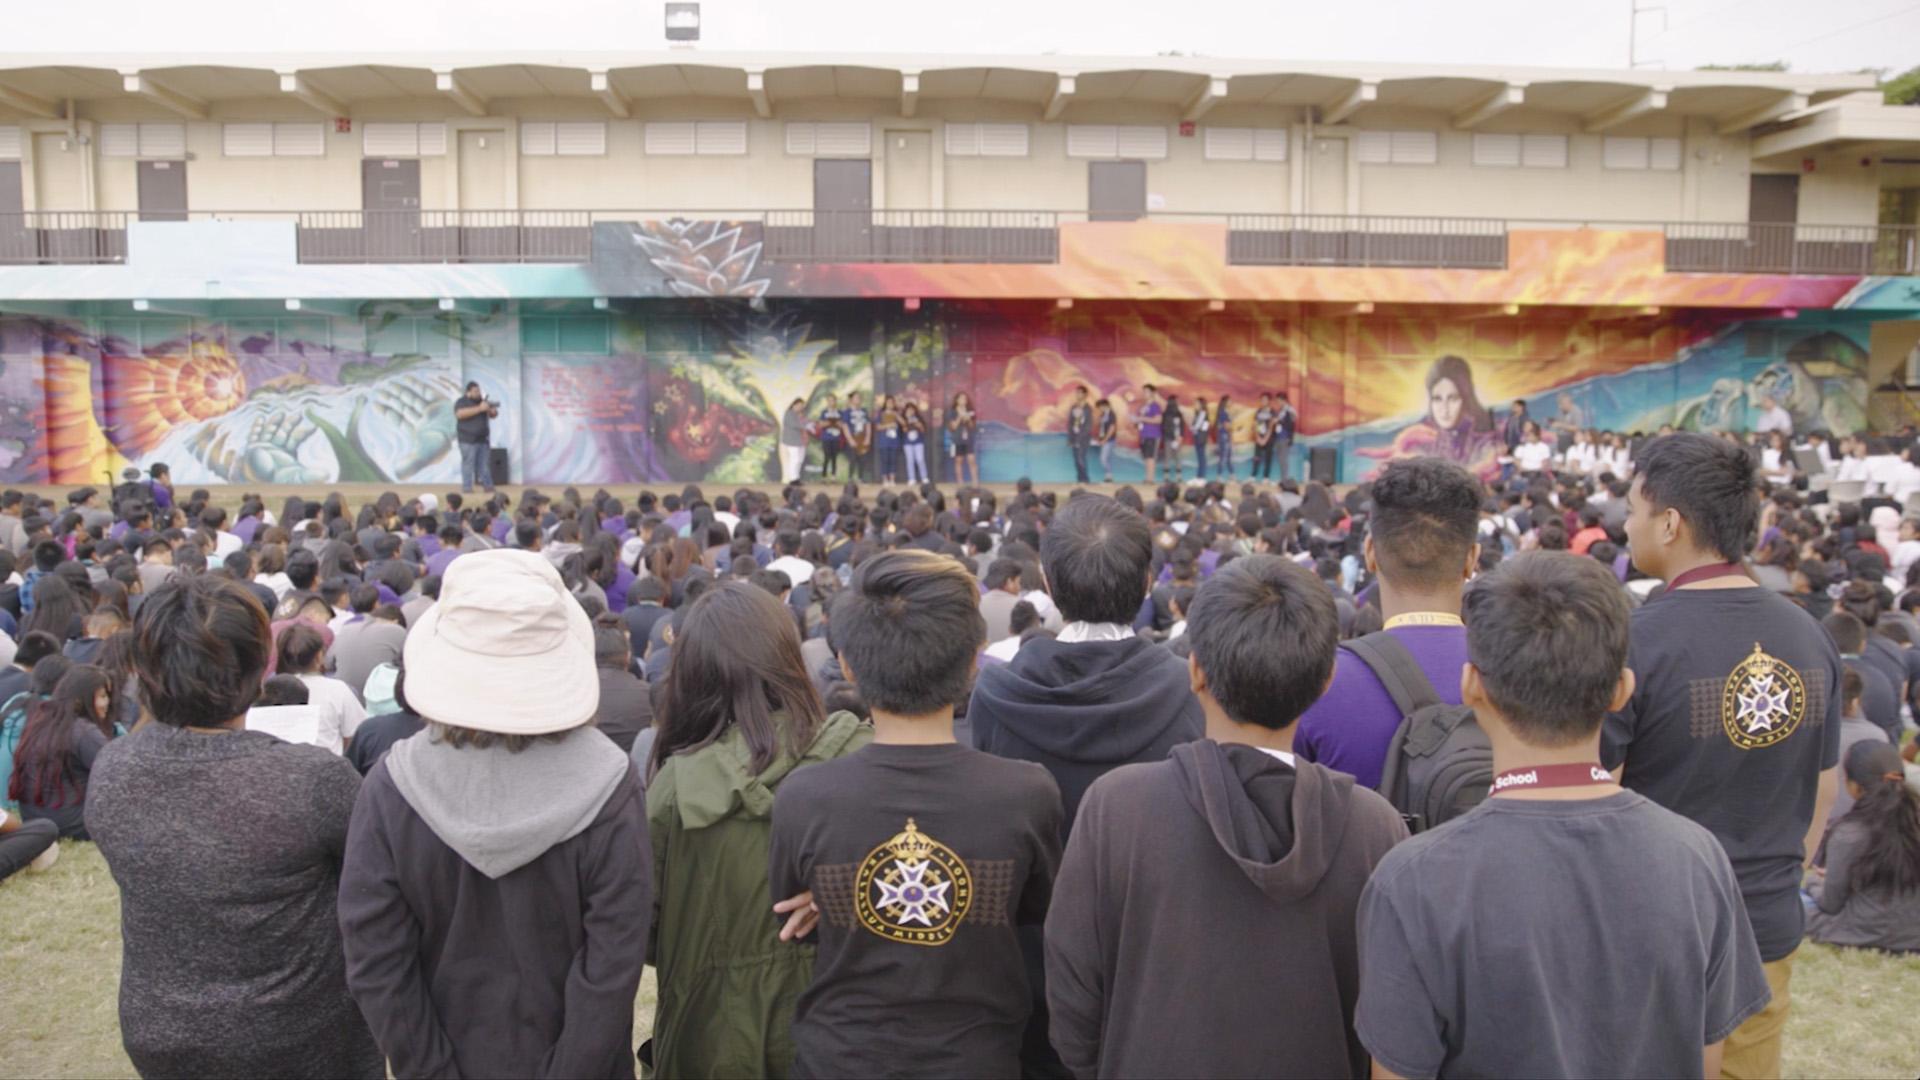 Mele Mural – Kalakaua Middle School